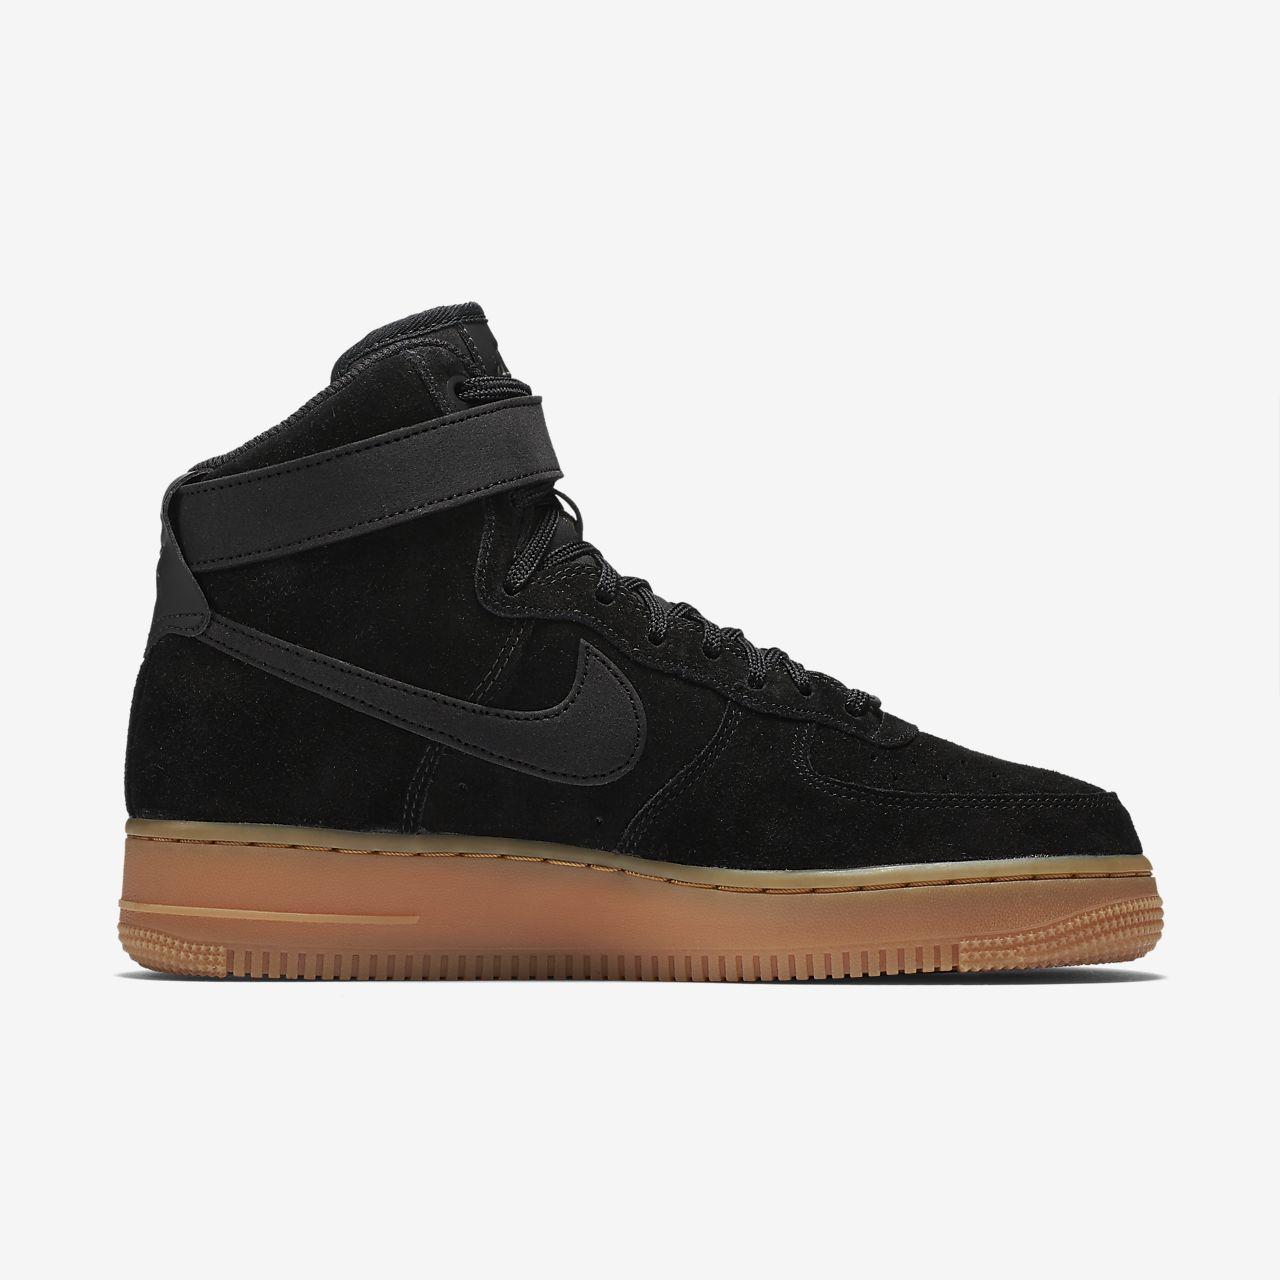 Air Force 1 High 07 Calzado verde Nike 5f2eh